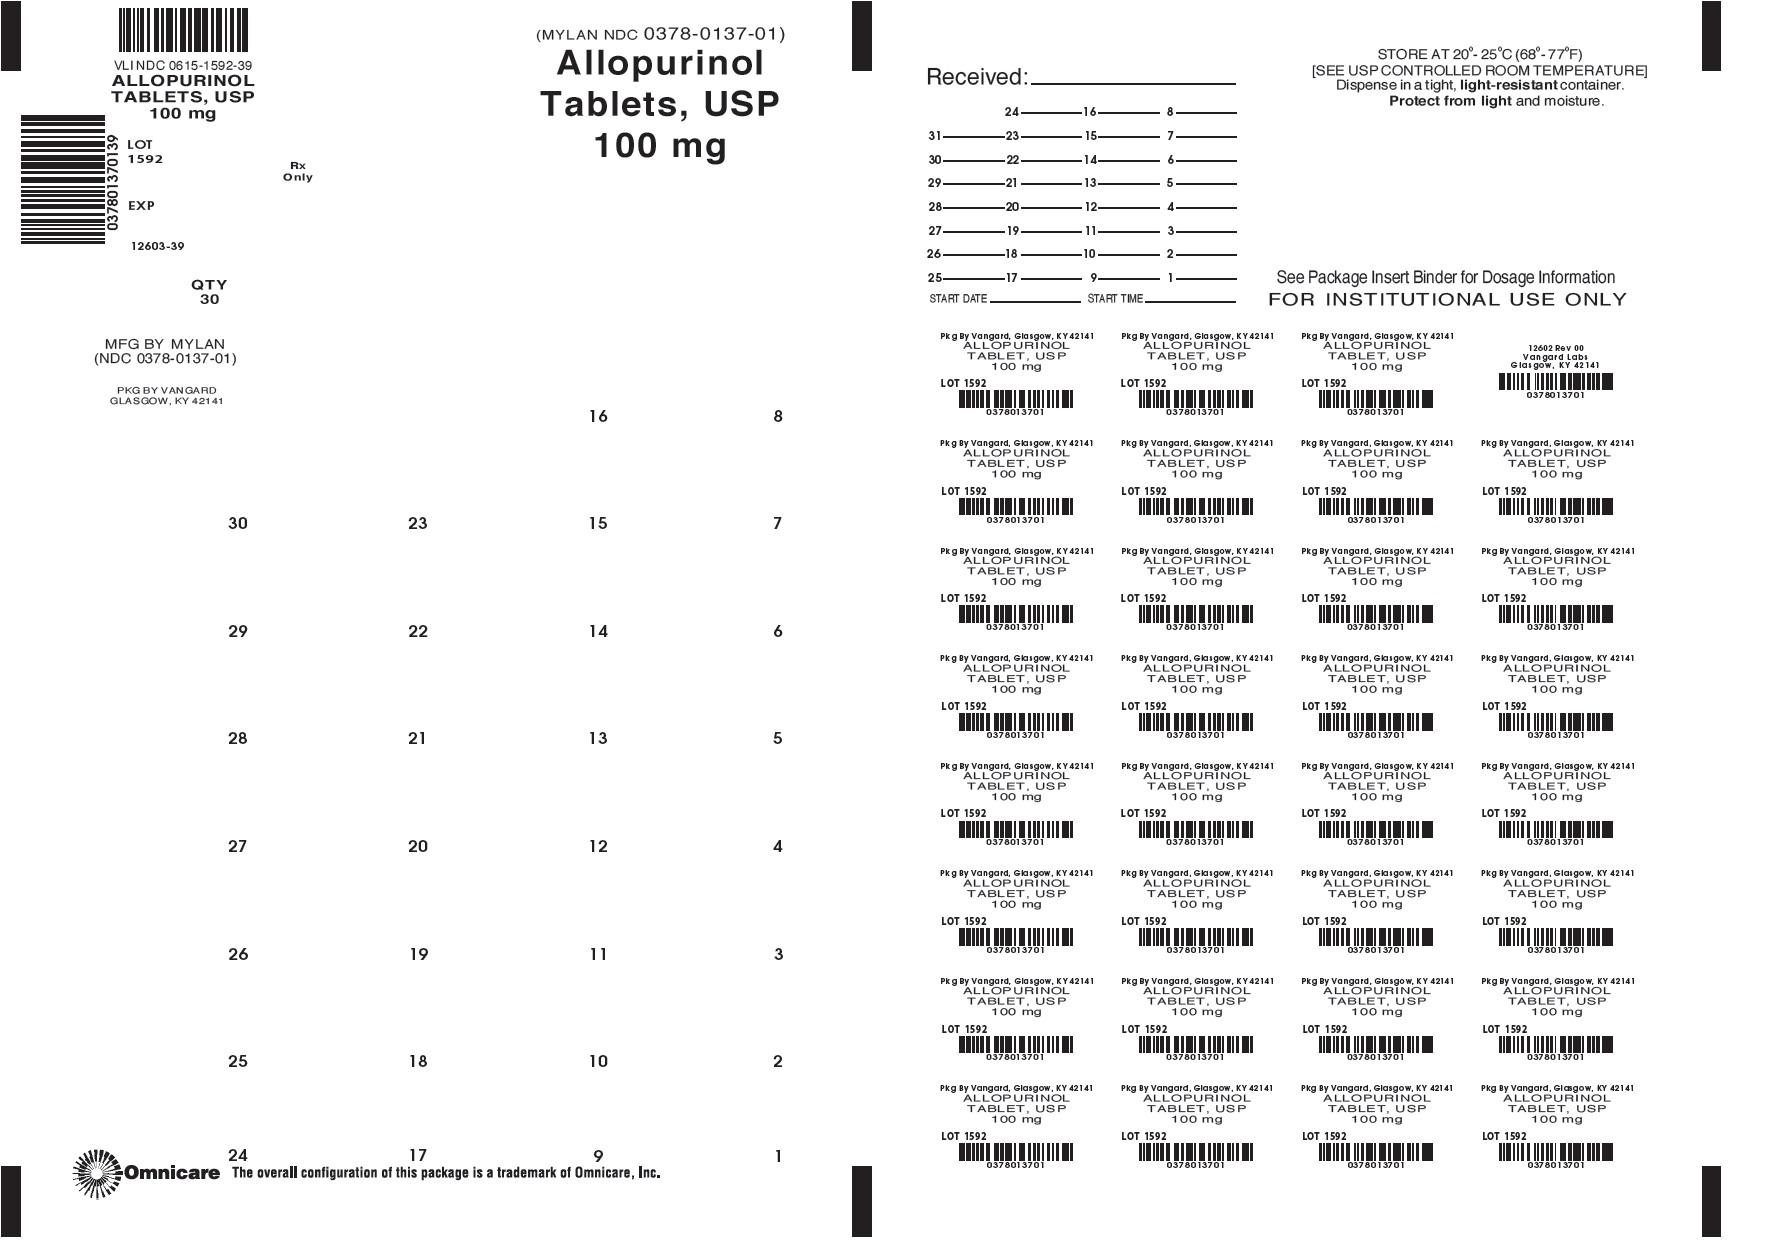 Allopurinol 100mg bingo card label